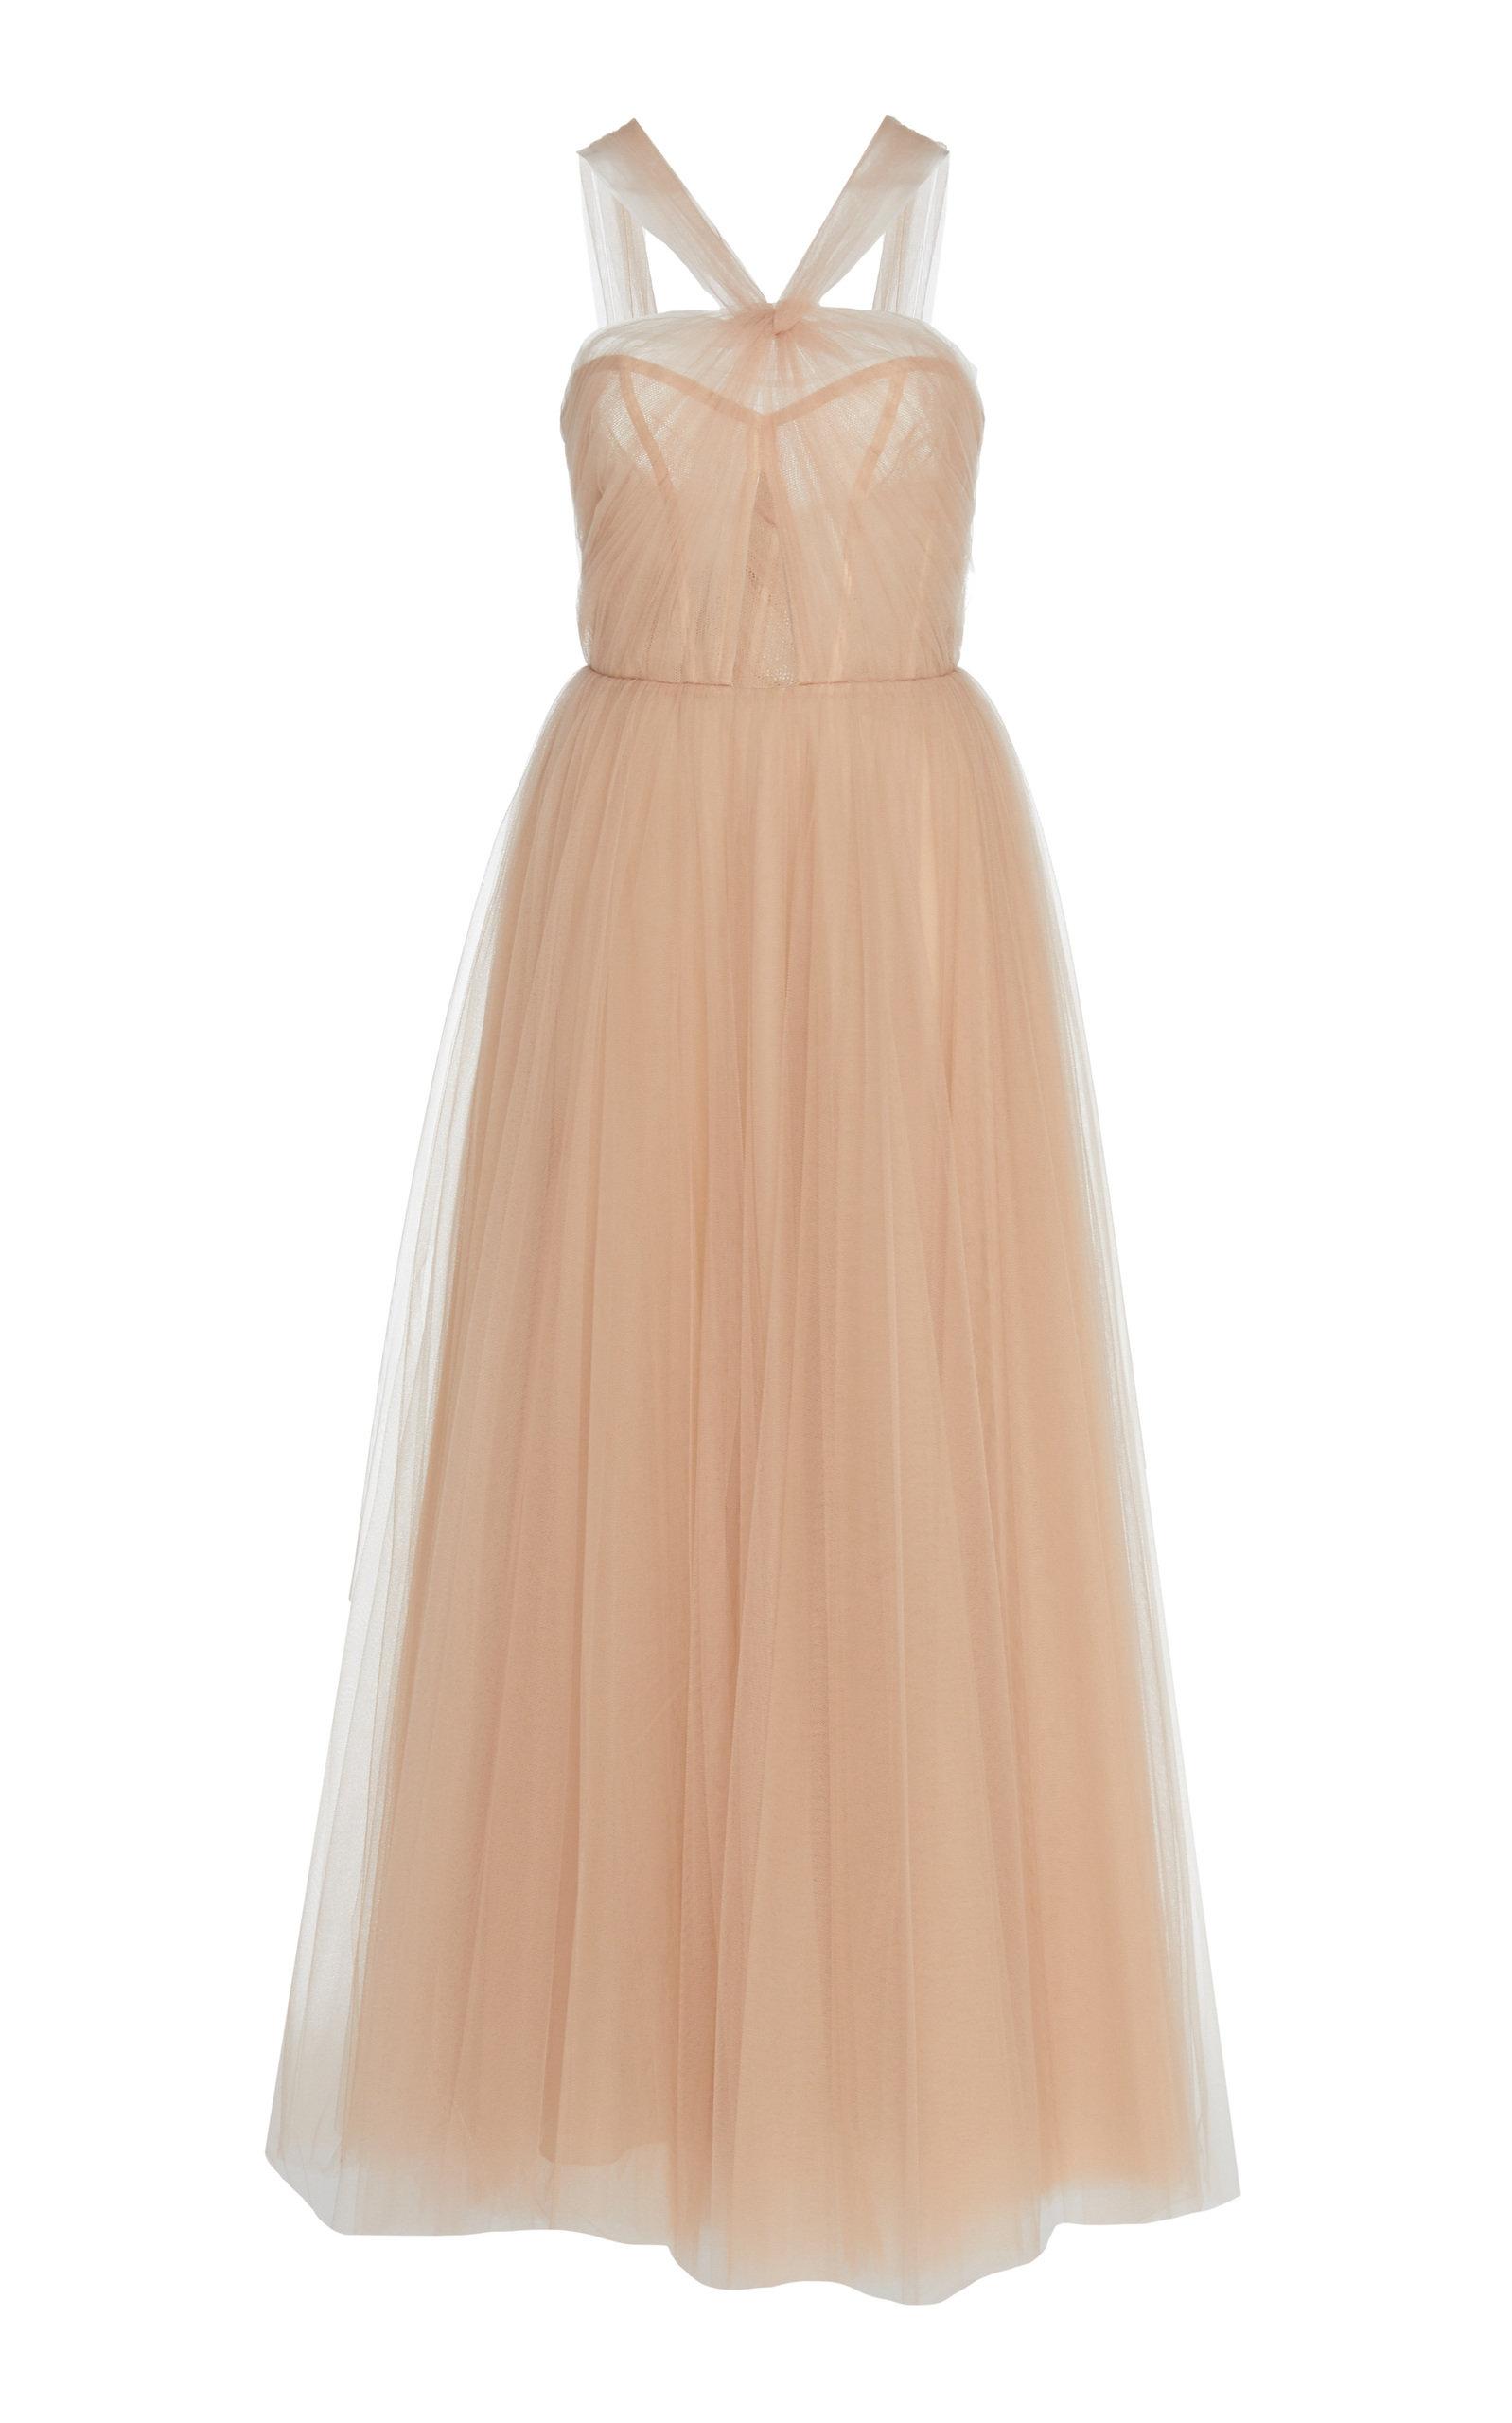 Buy Monique Lhuillier Halter Fit-And-Flare Tulle Gown online, shop Monique Lhuillier at the best price